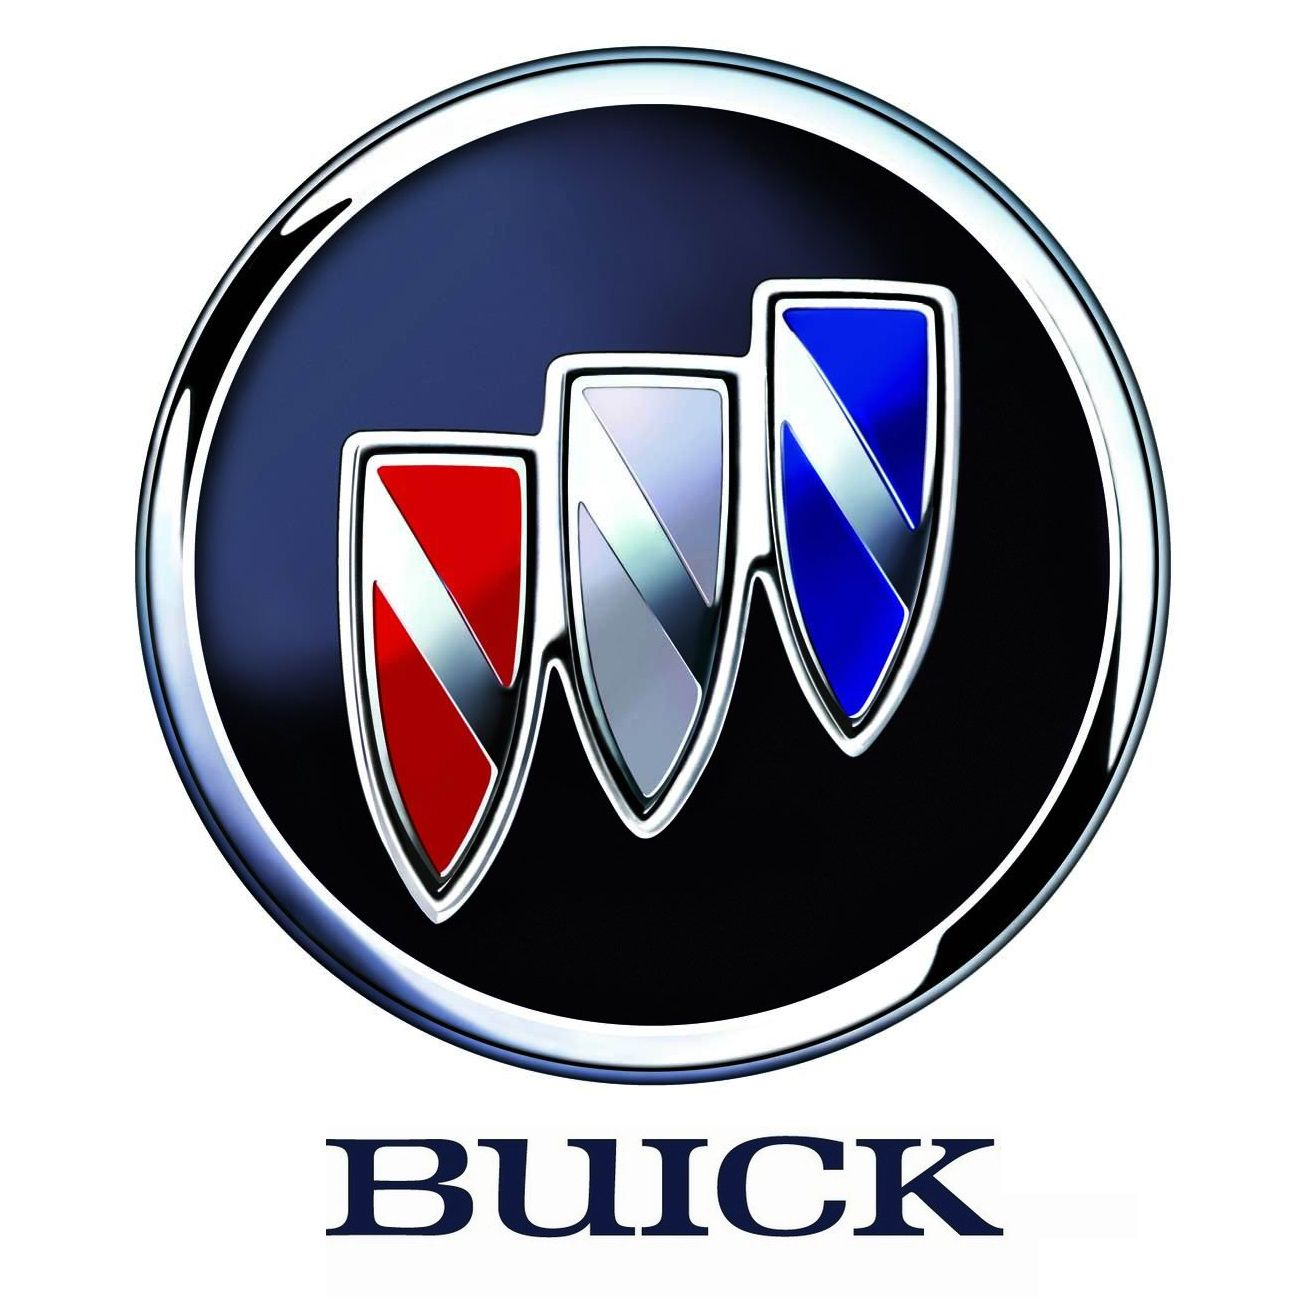 buick logo Google Search Car logos, American car logos